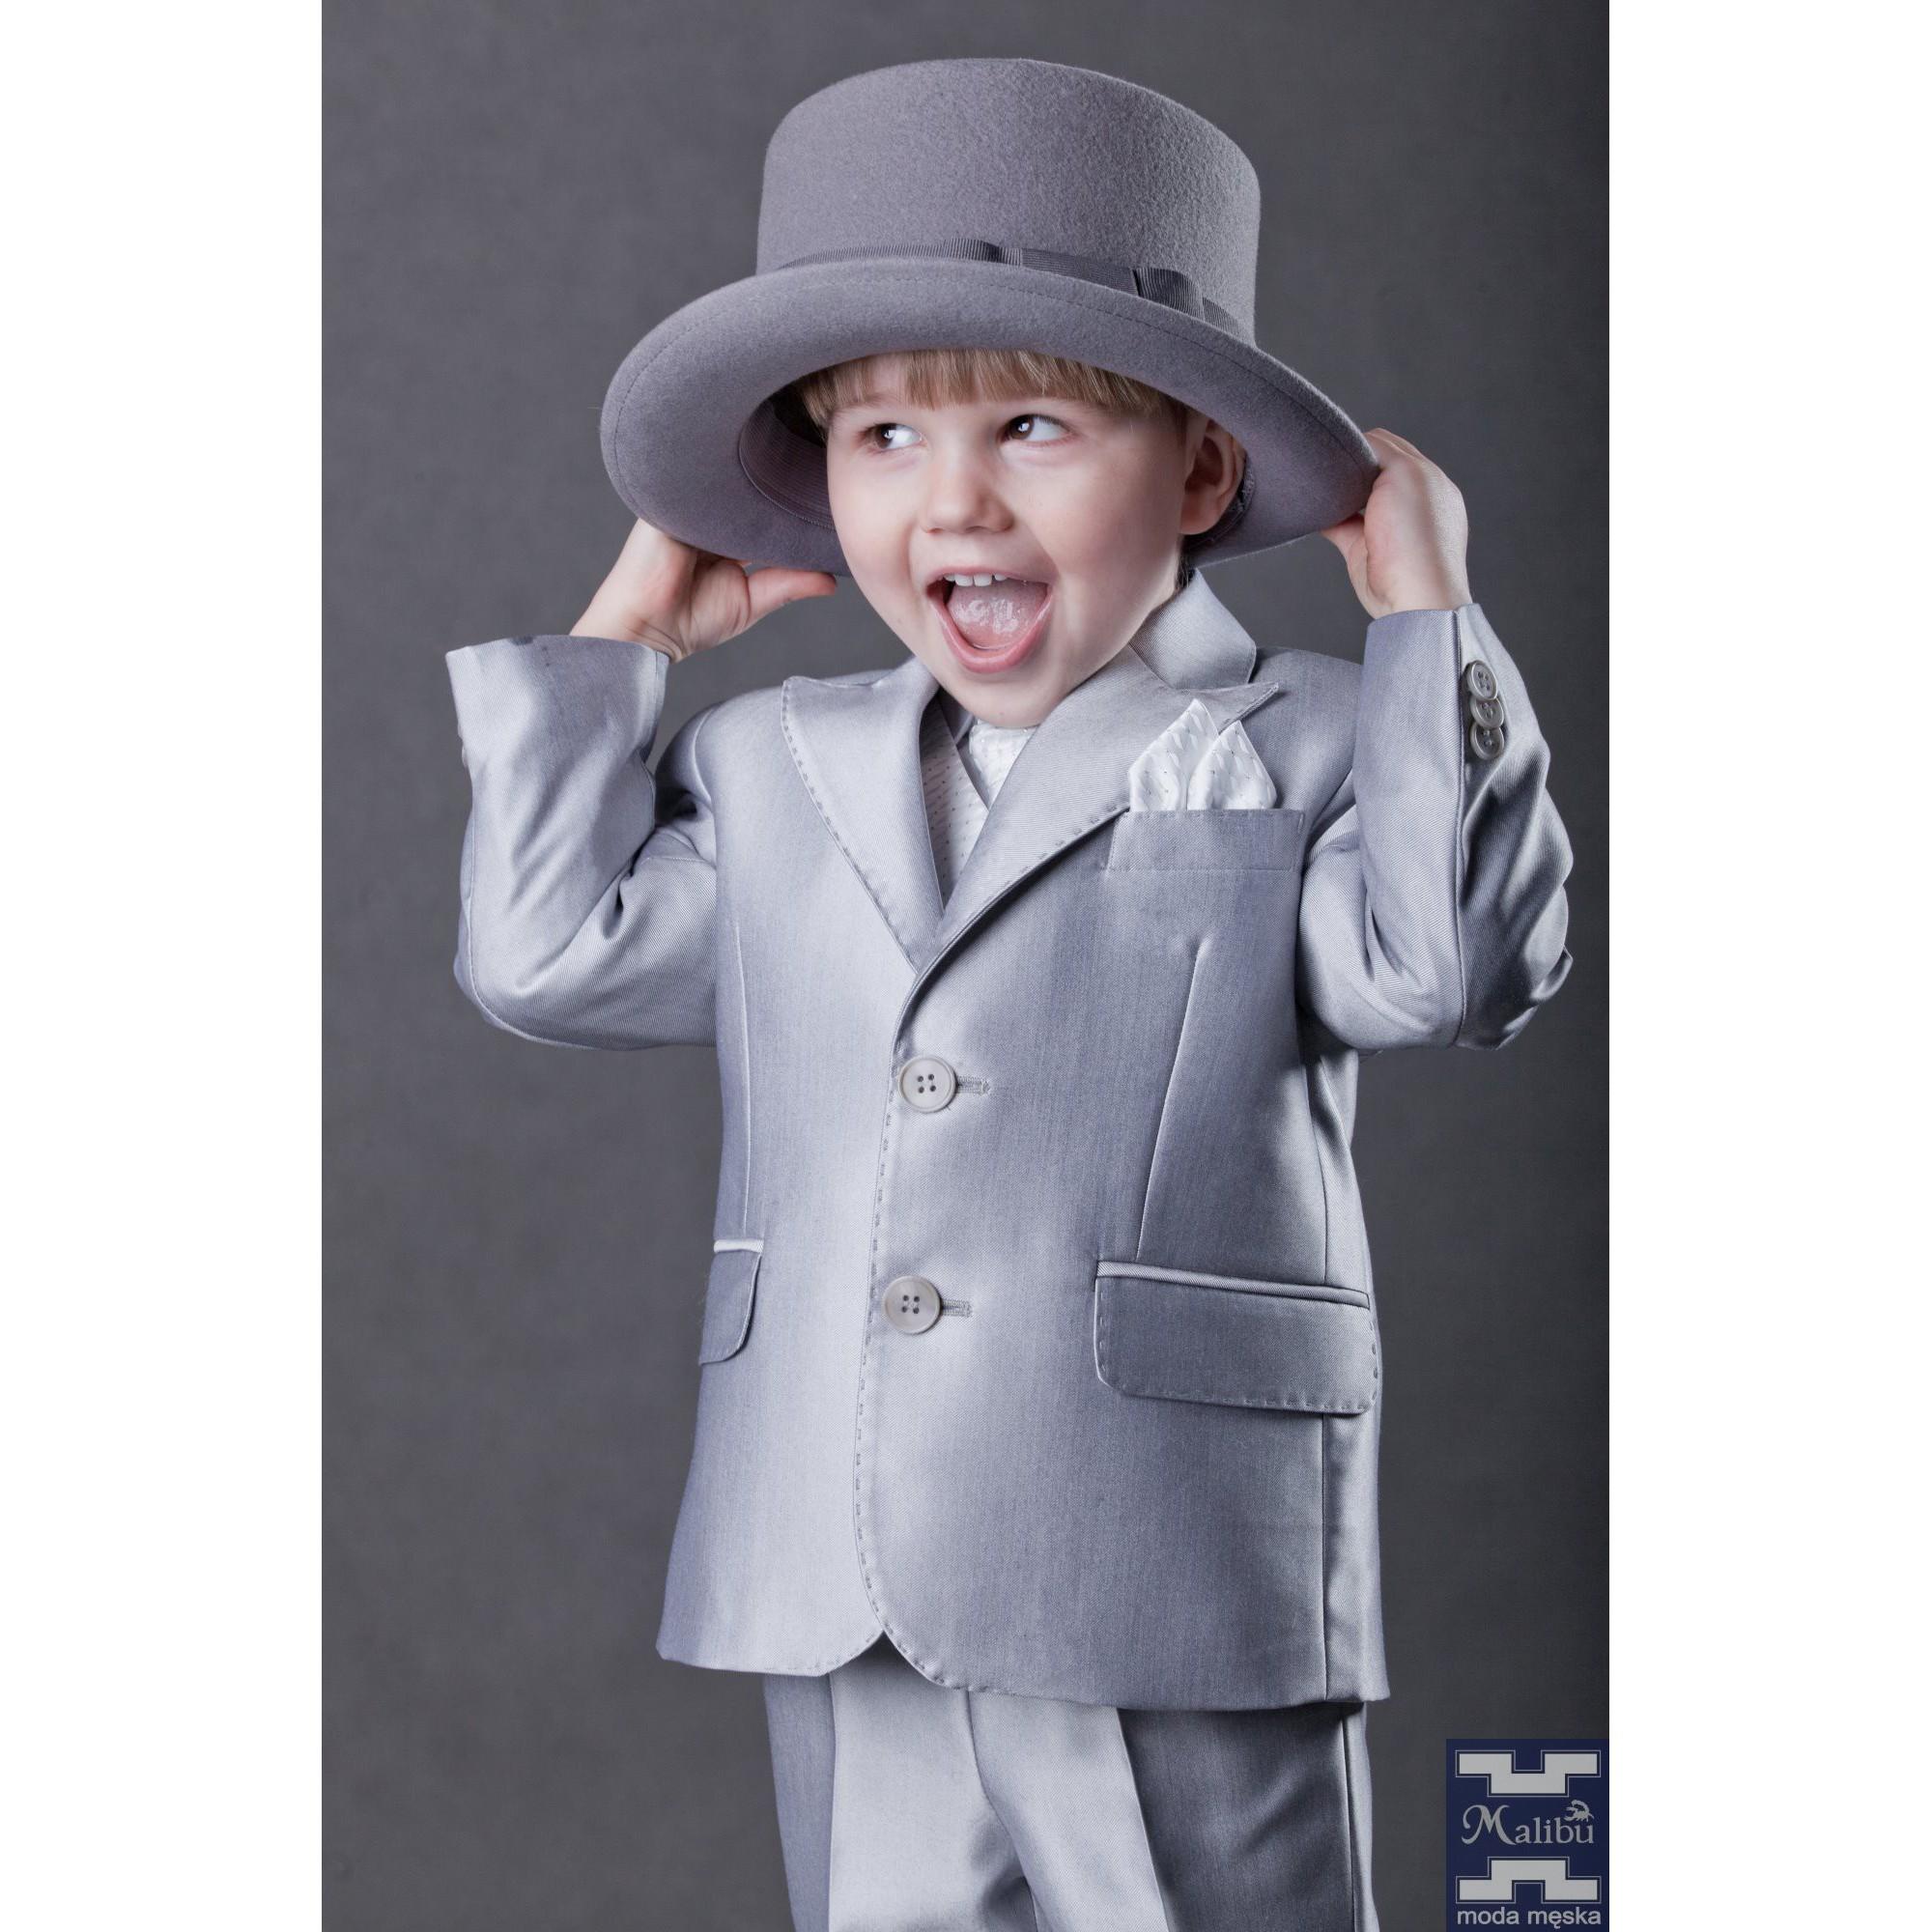 0951a9bf9a5ee Srebrny garnitur dziecięcy